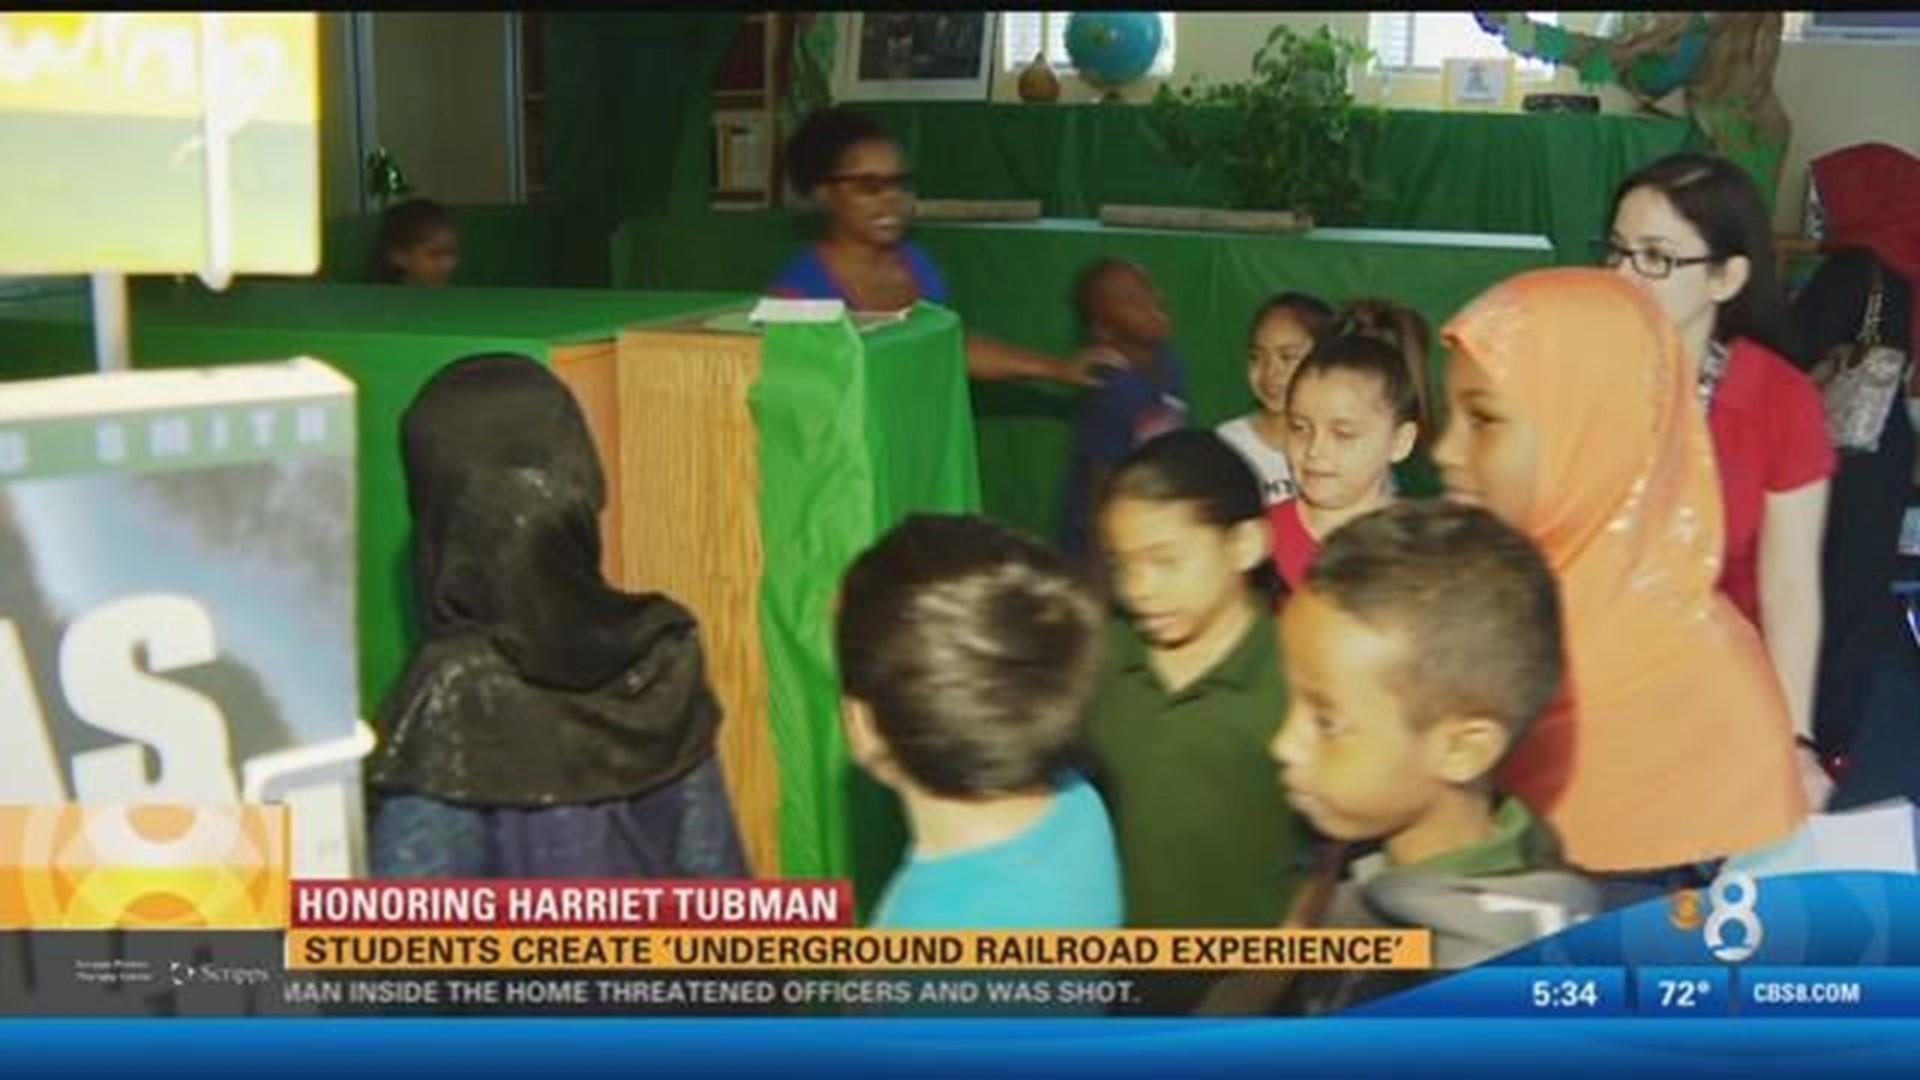 Honoring Harriet Tubman Students Create Underground